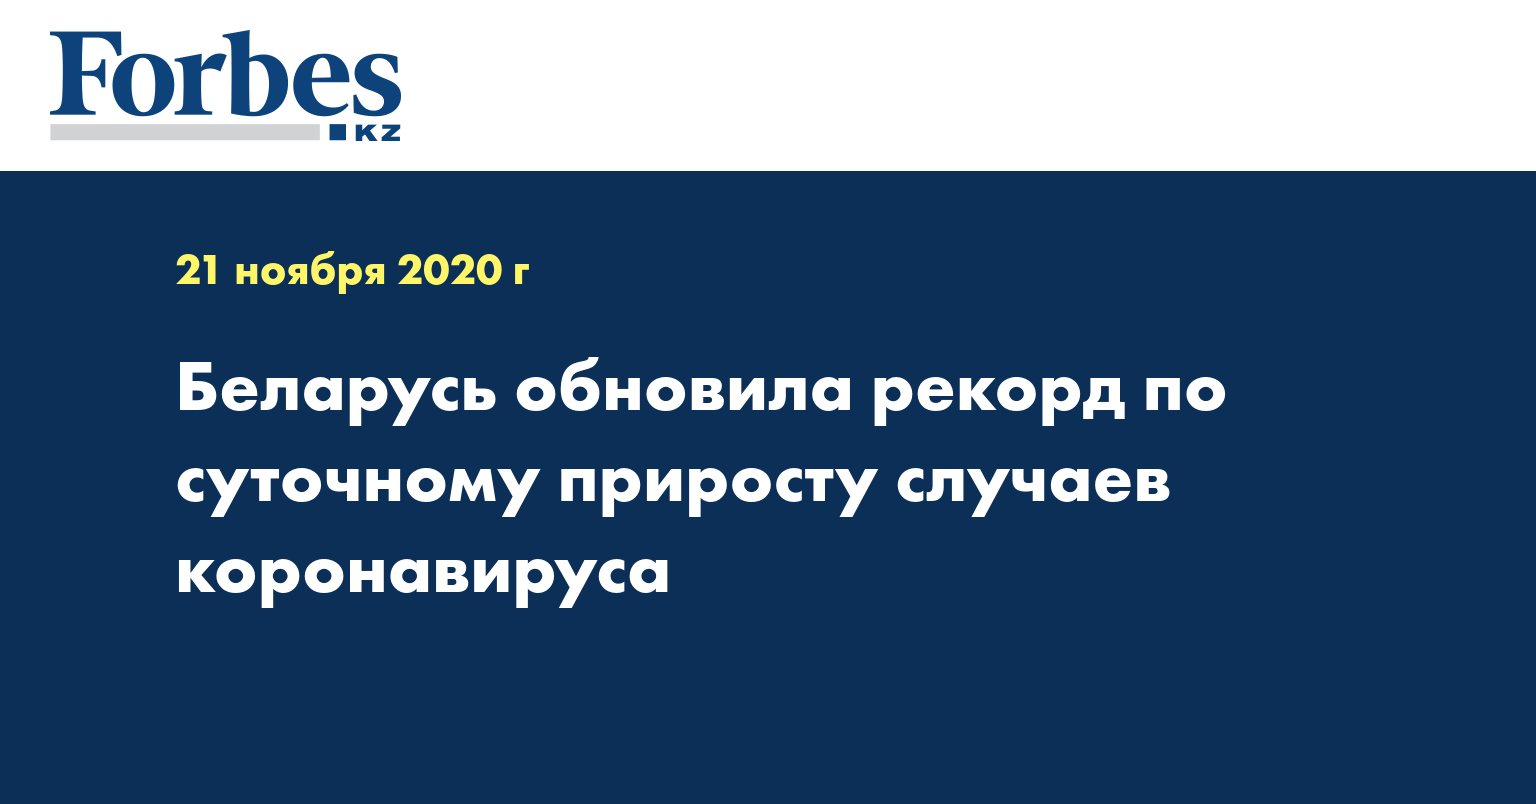 Беларусь обновила рекорд по суточному приросту случаев коронавируса